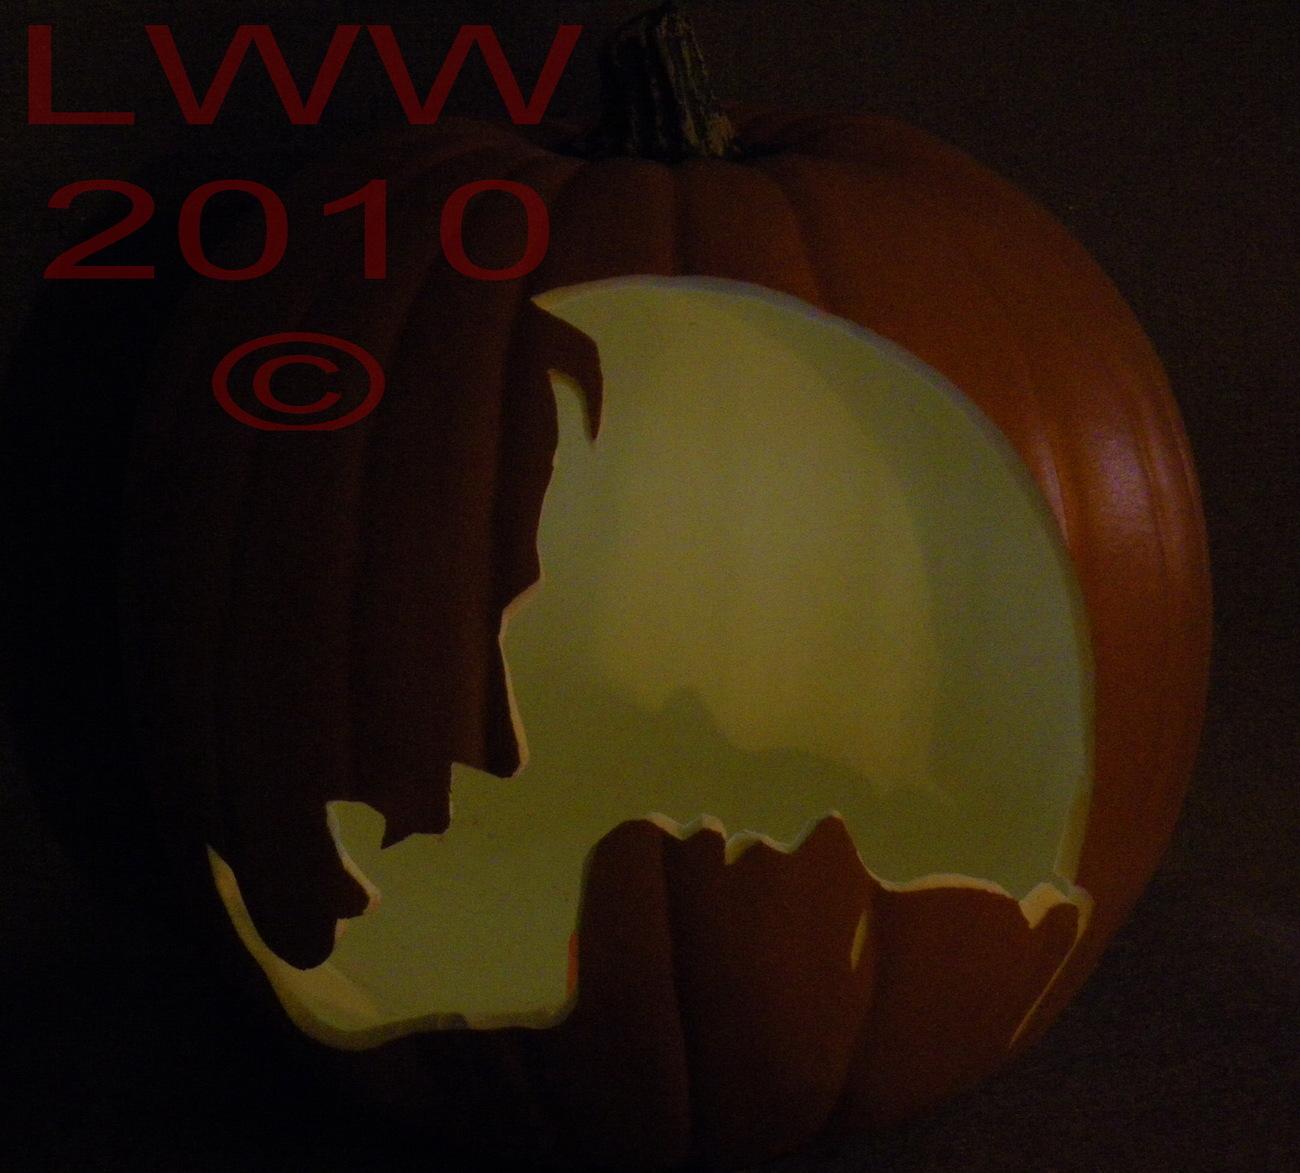 Hand-carved Vampire & Woman Foam Jack-o-lantern Pumpkin Halloween